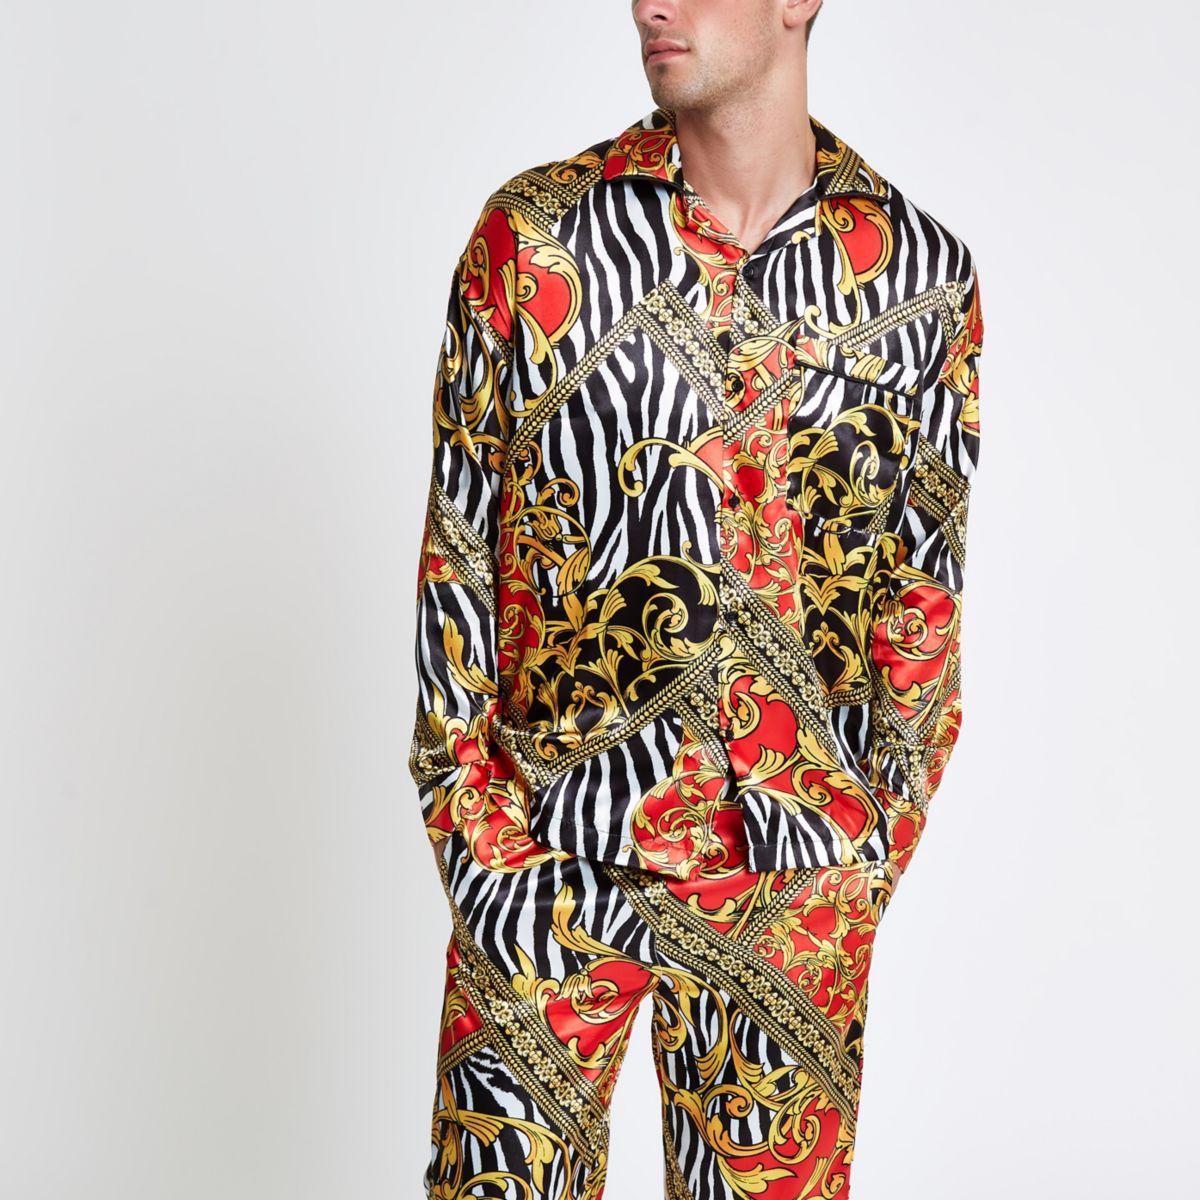 Jaded yellow zebra print pyjama shirt